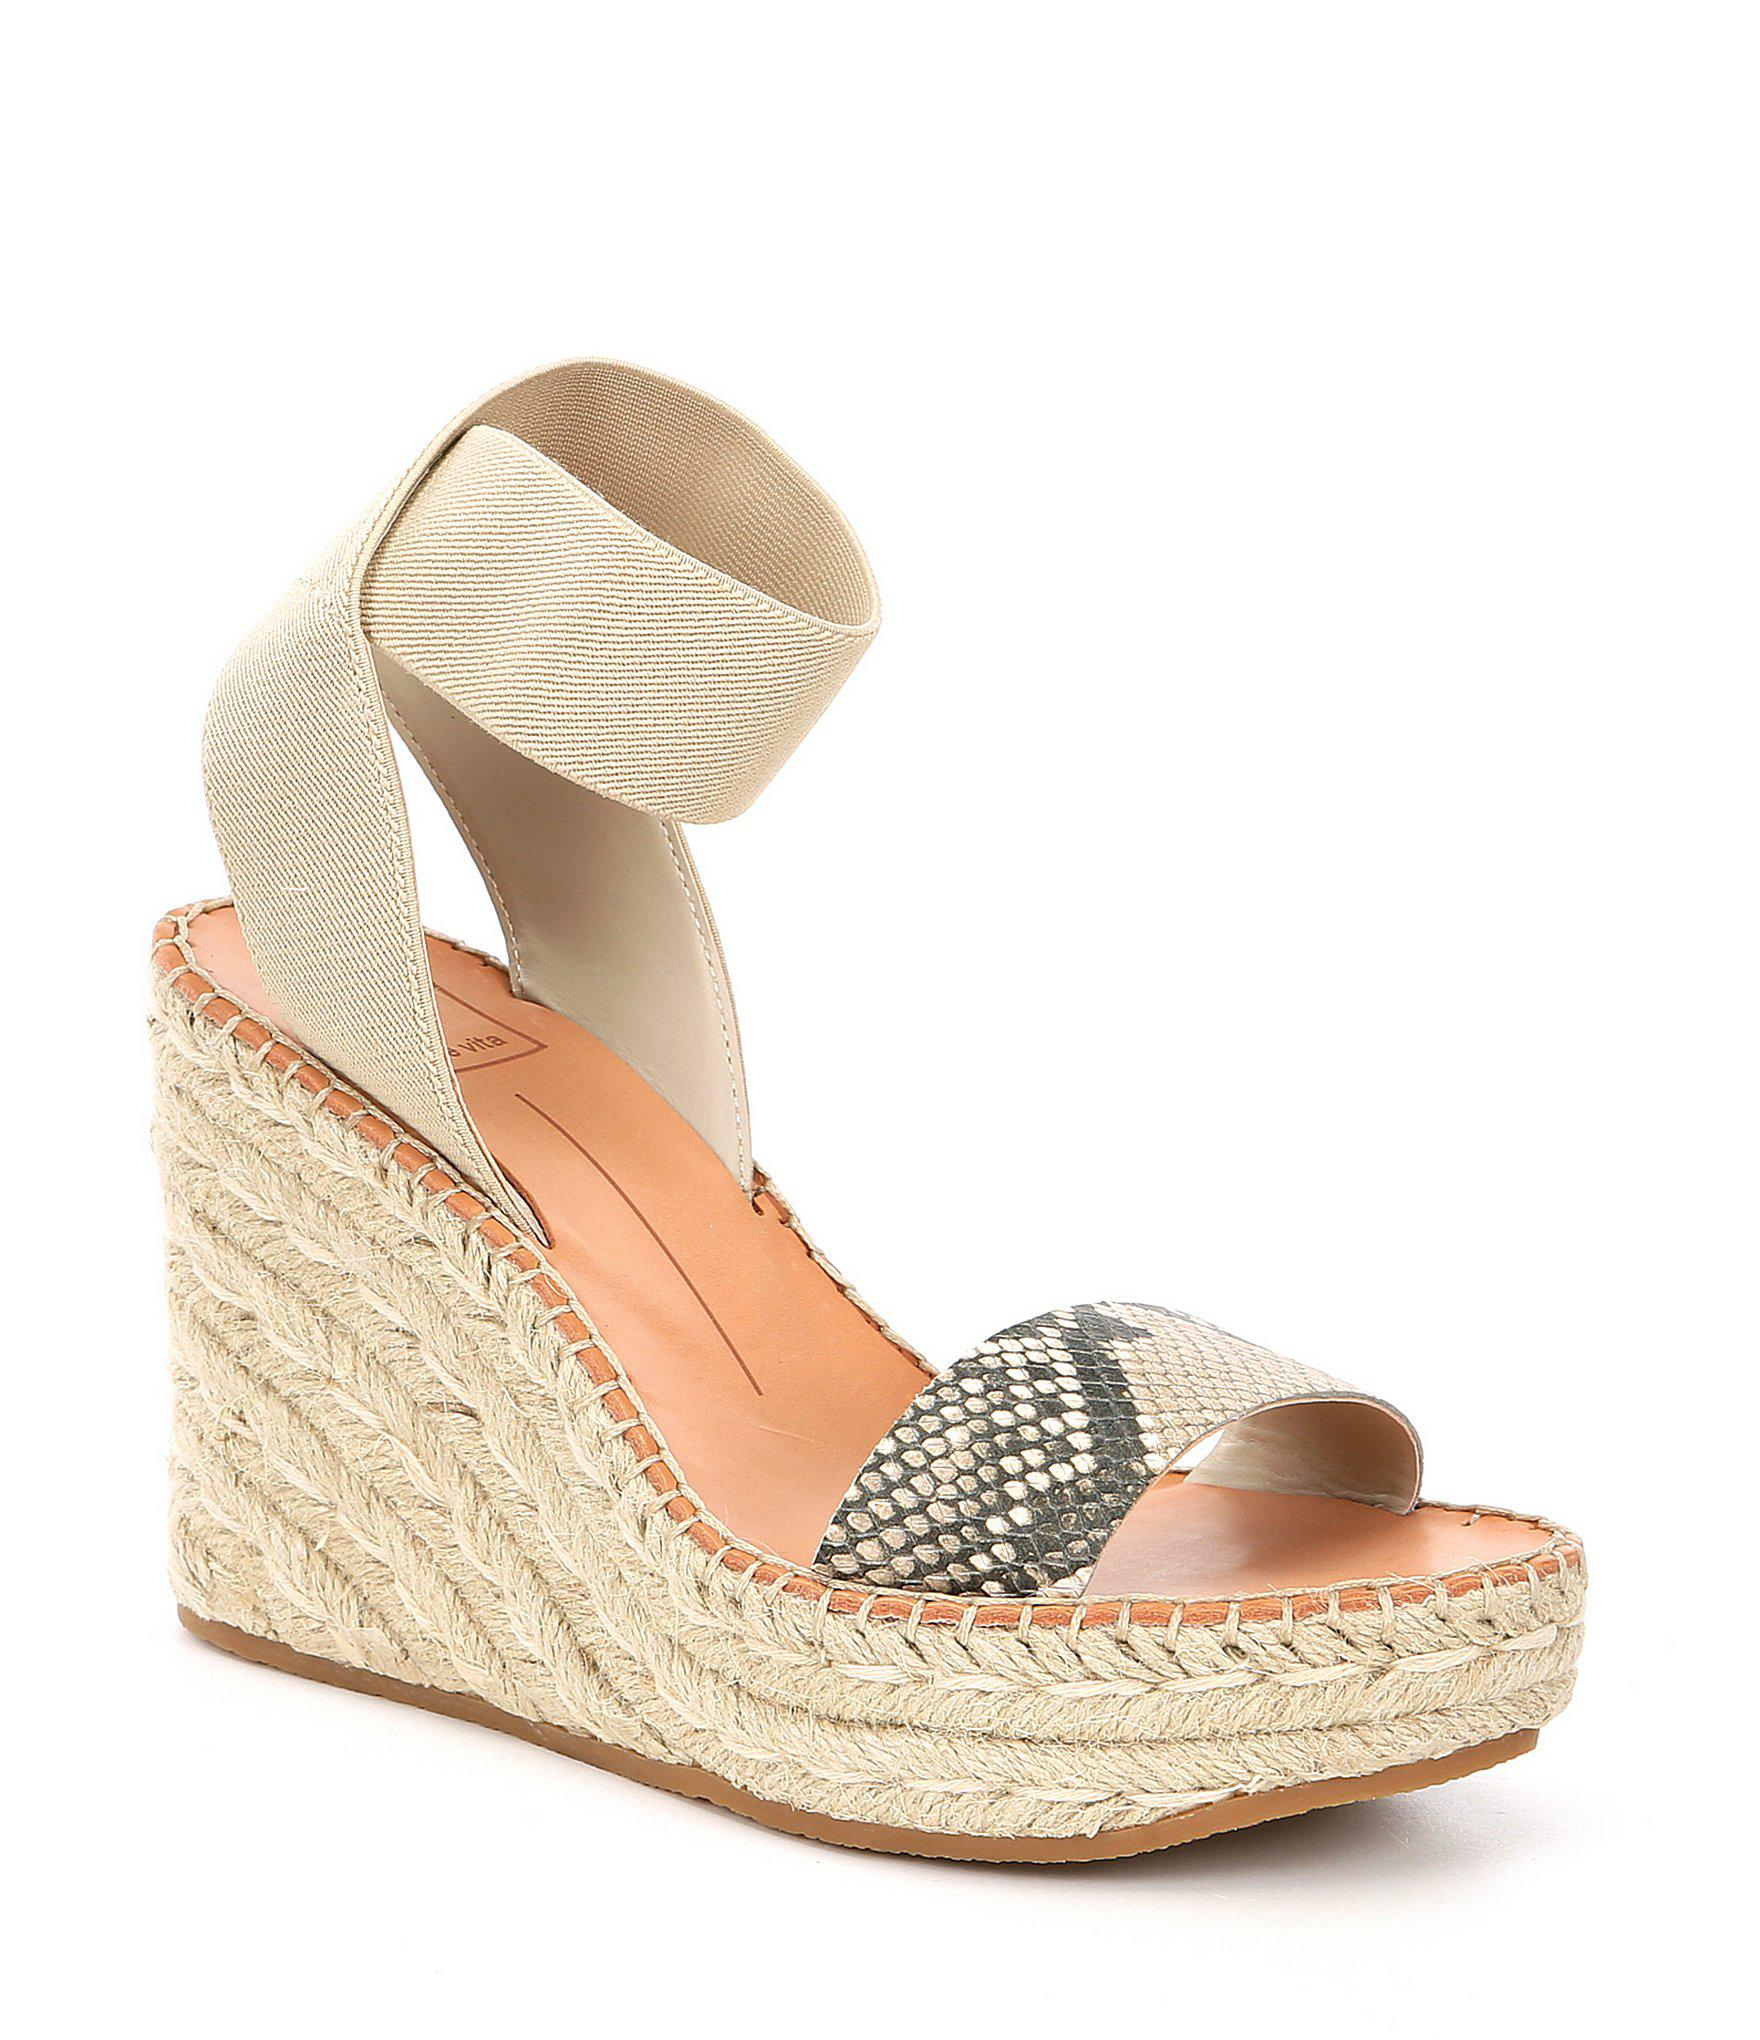 5b00eb0c08f Lyst - Dolce Vita Pavlin Snake Print Espadrille Wedge Sandals